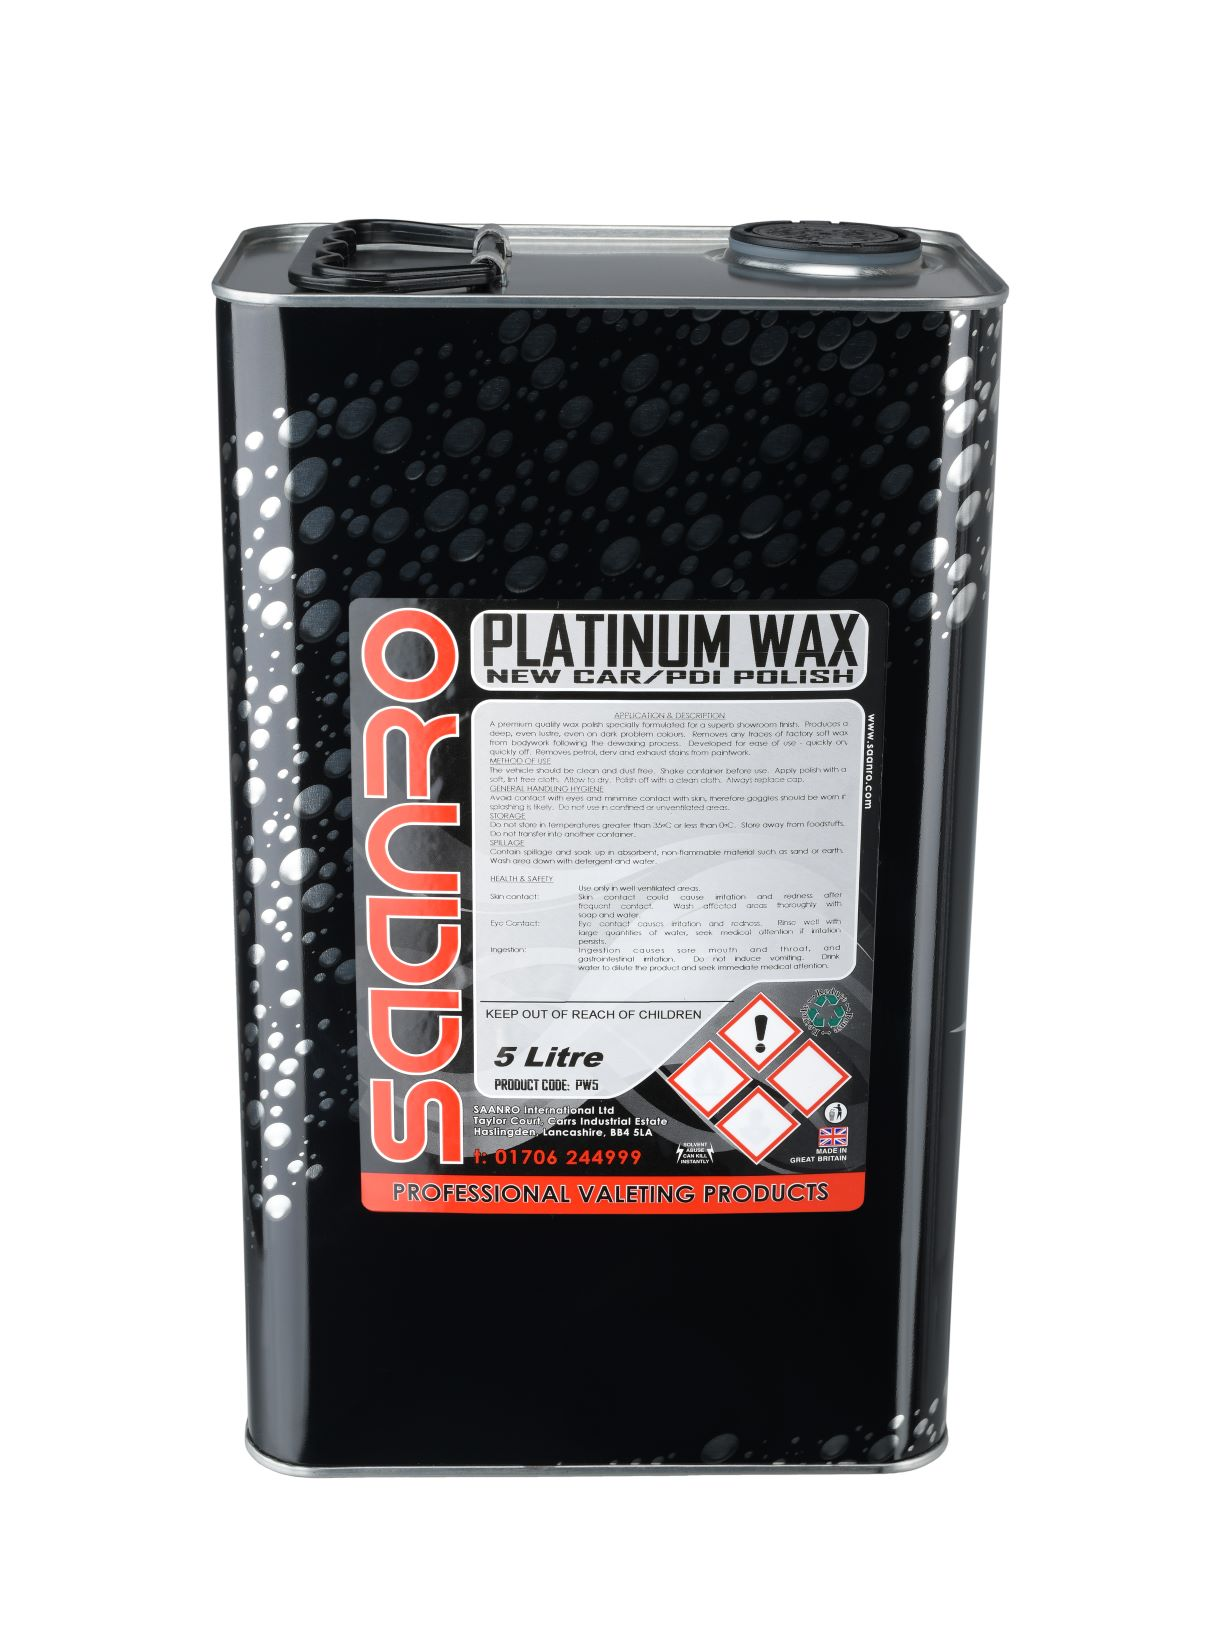 Saanro Platinum Wax 5 Litre